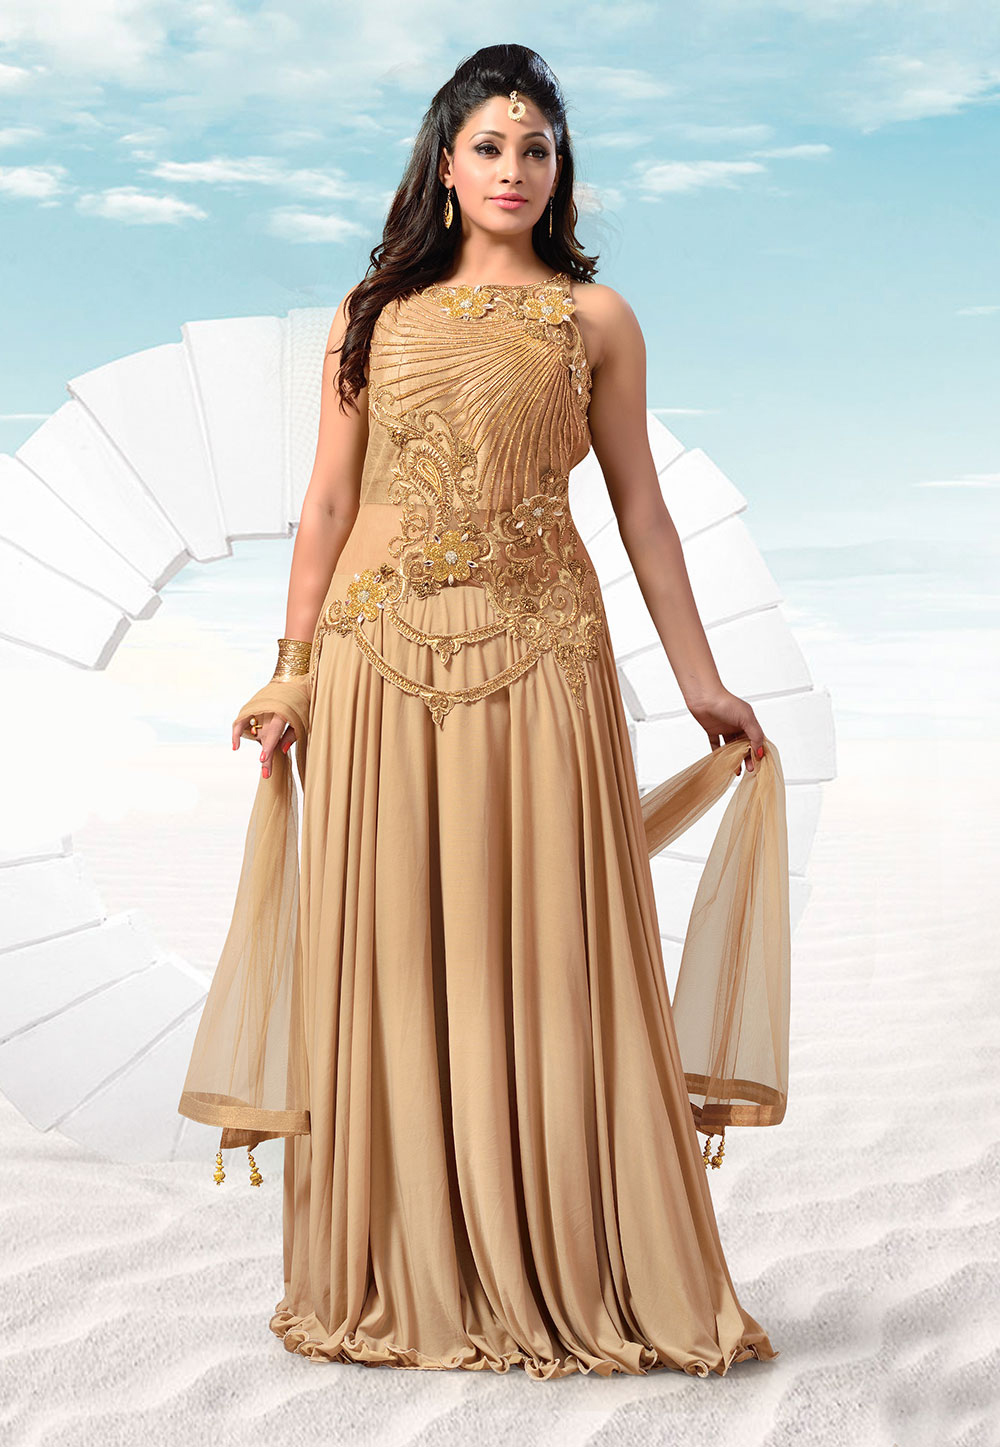 An Abaya style churidar Kameez in golden color. (Image: Utsavfashion.com)